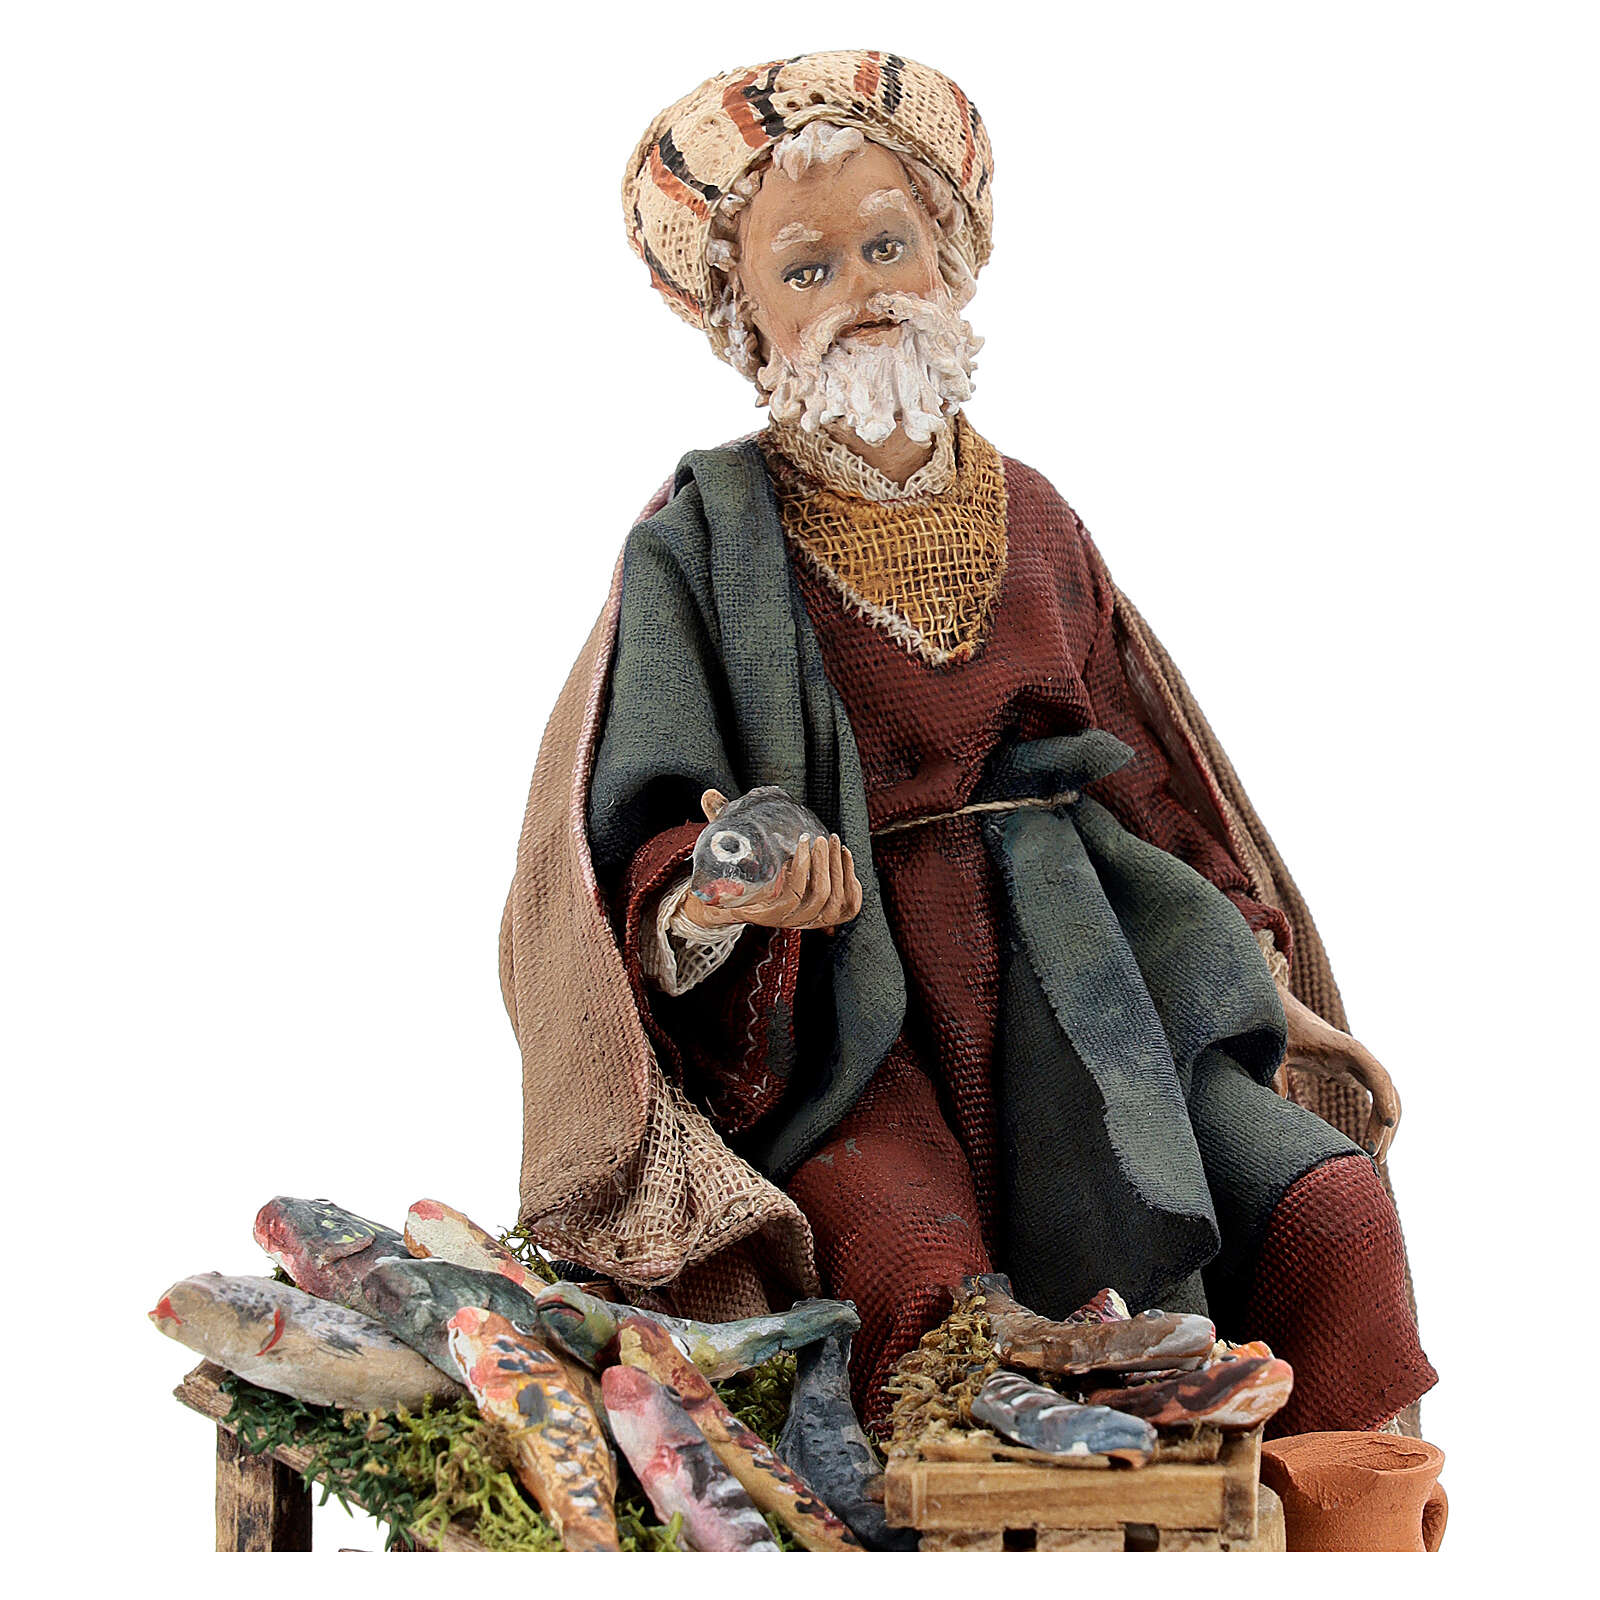 Nativity scene figurine, fish seller 13 cm made by Angela Tripi 4